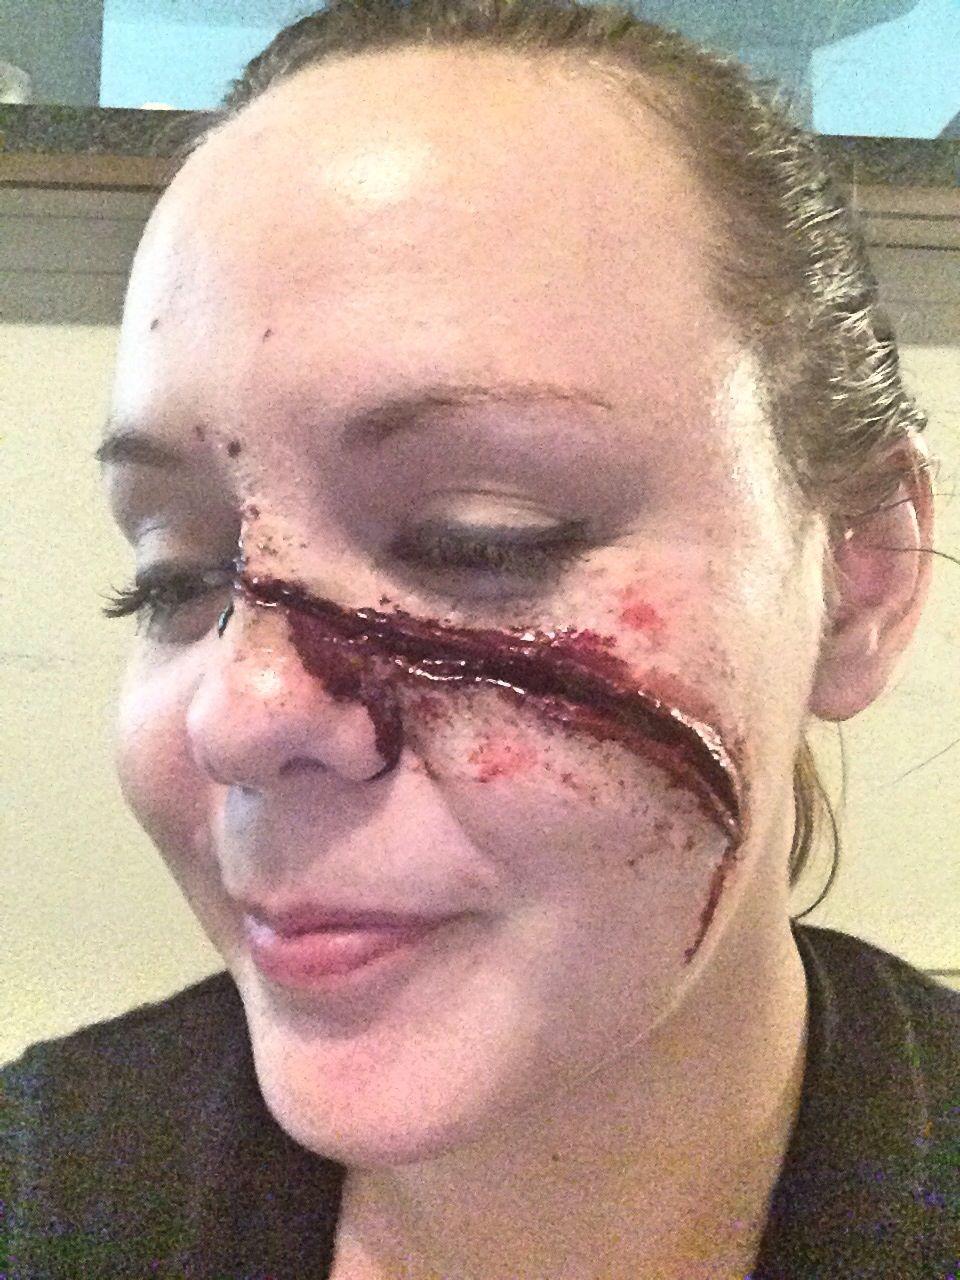 Scar Makeup Kit - Party City | Fright Night 10/31 | Pinterest ...